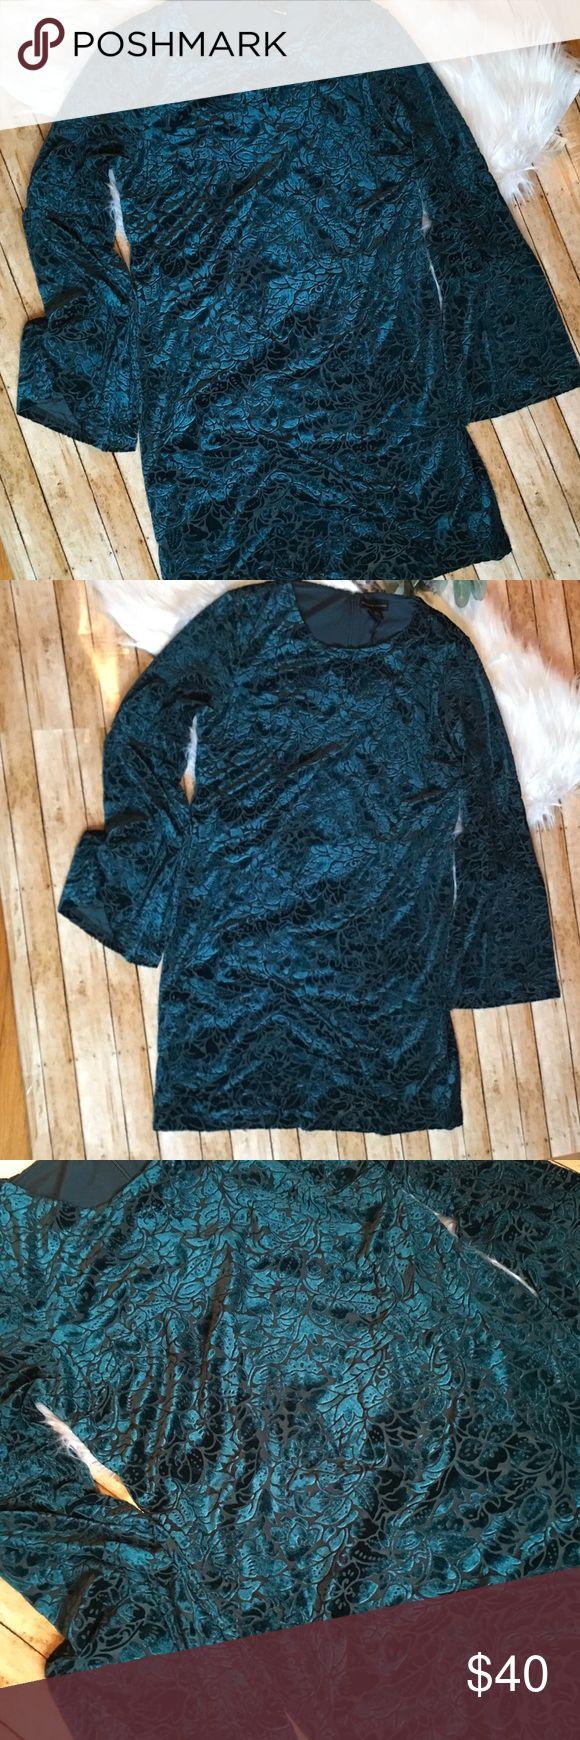 "Adrienne Vittadini NWT Teal Velvet Dress Adrienne Vittadini NWT Teal Velvet Dress Size m  Color- rich pretty teal Sheer bell cuff sleeves  Scoop neck Approx 34.5"" L 37"" B 27"" Sleeve Back zipper Smoke free home Adrienne Vittadini Dresses"